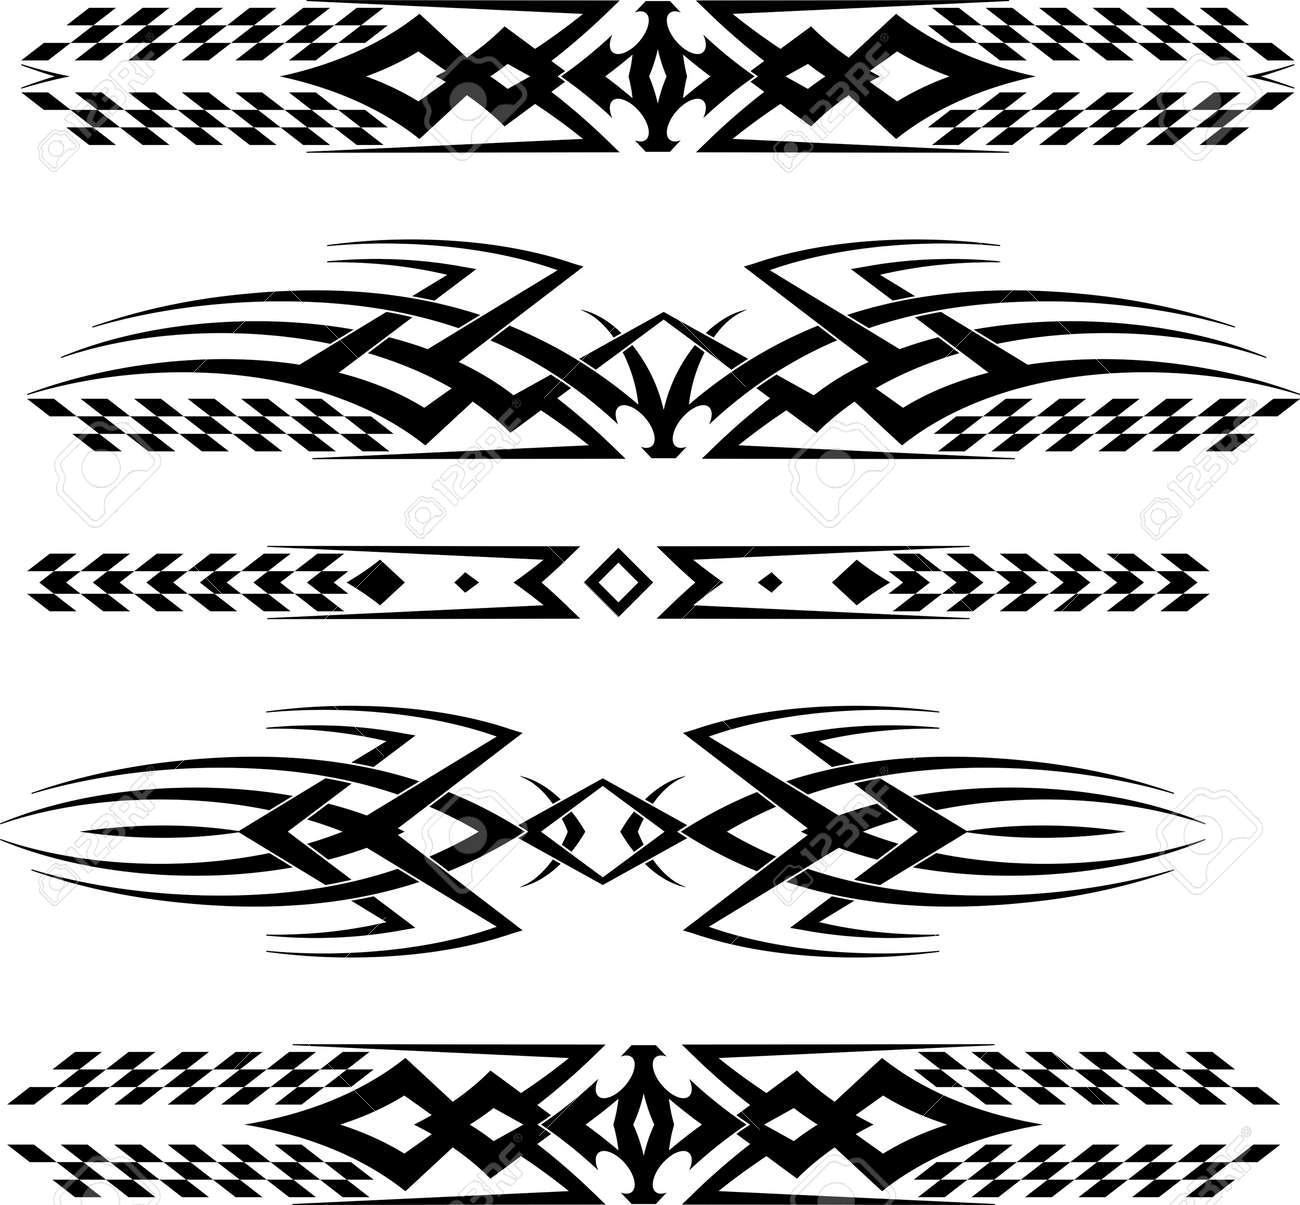 Car sticker design vector free - Tribal Car Decal Vinyl Ready Vector Illustration Stock Vector 55710689